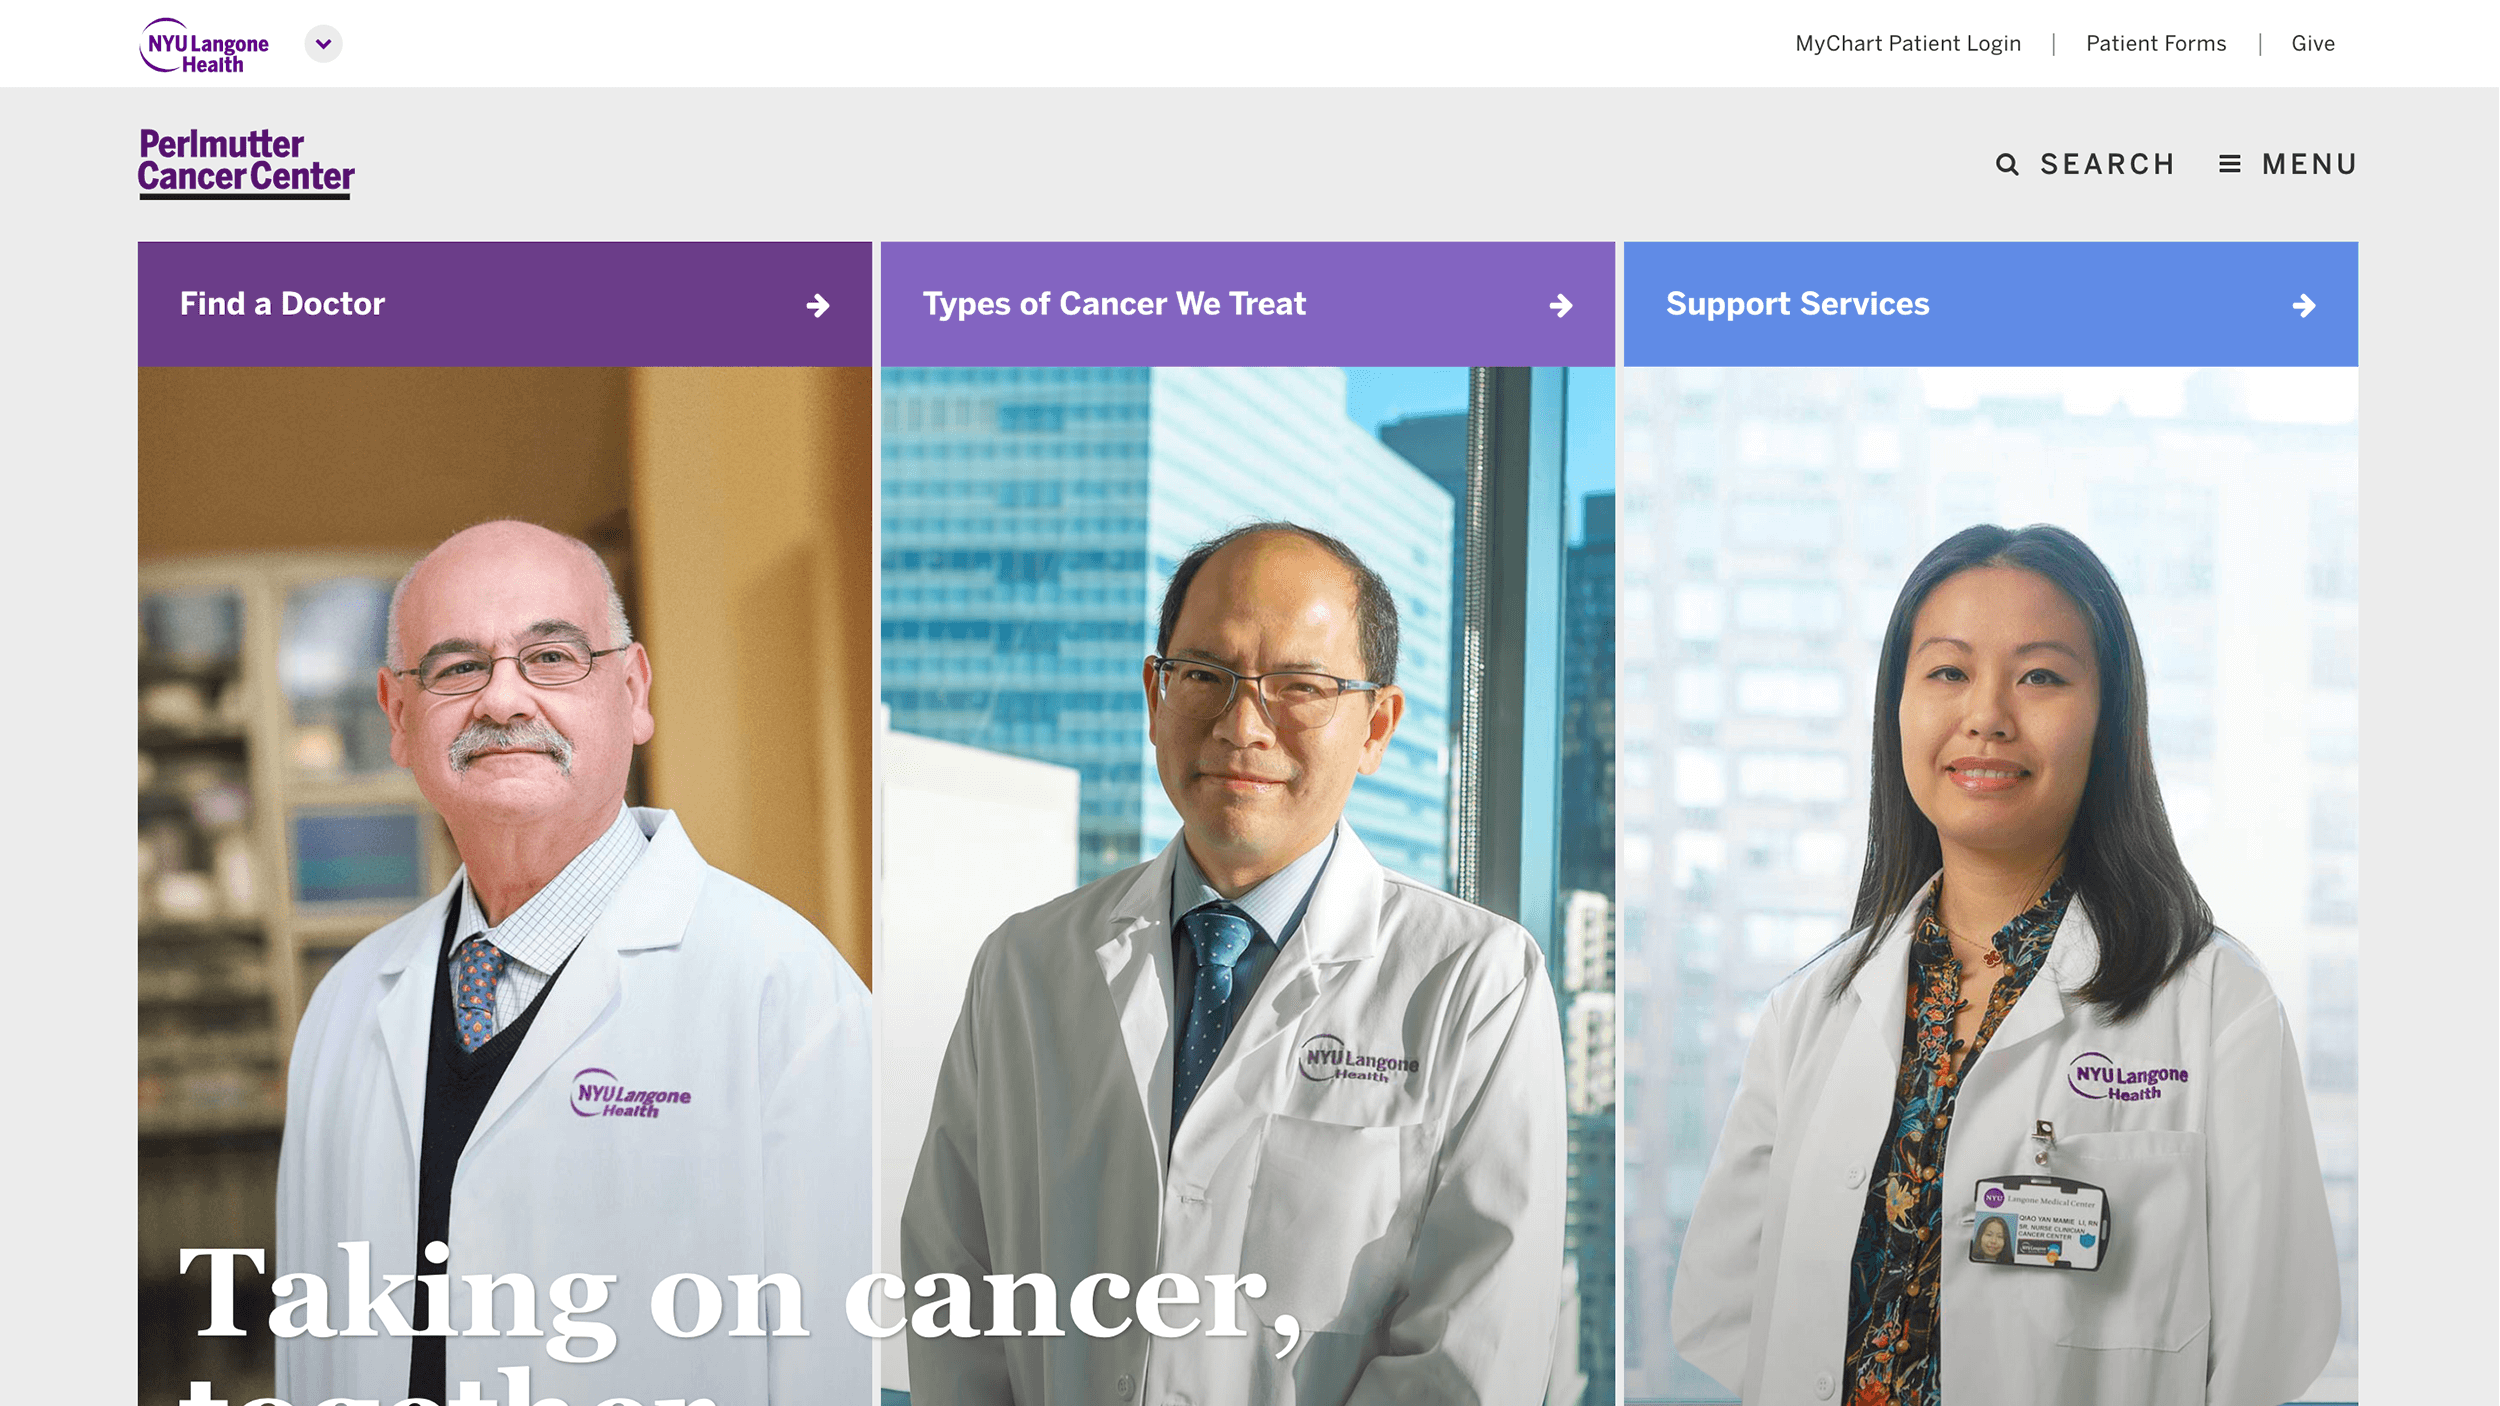 Perlmutter Cancer Center